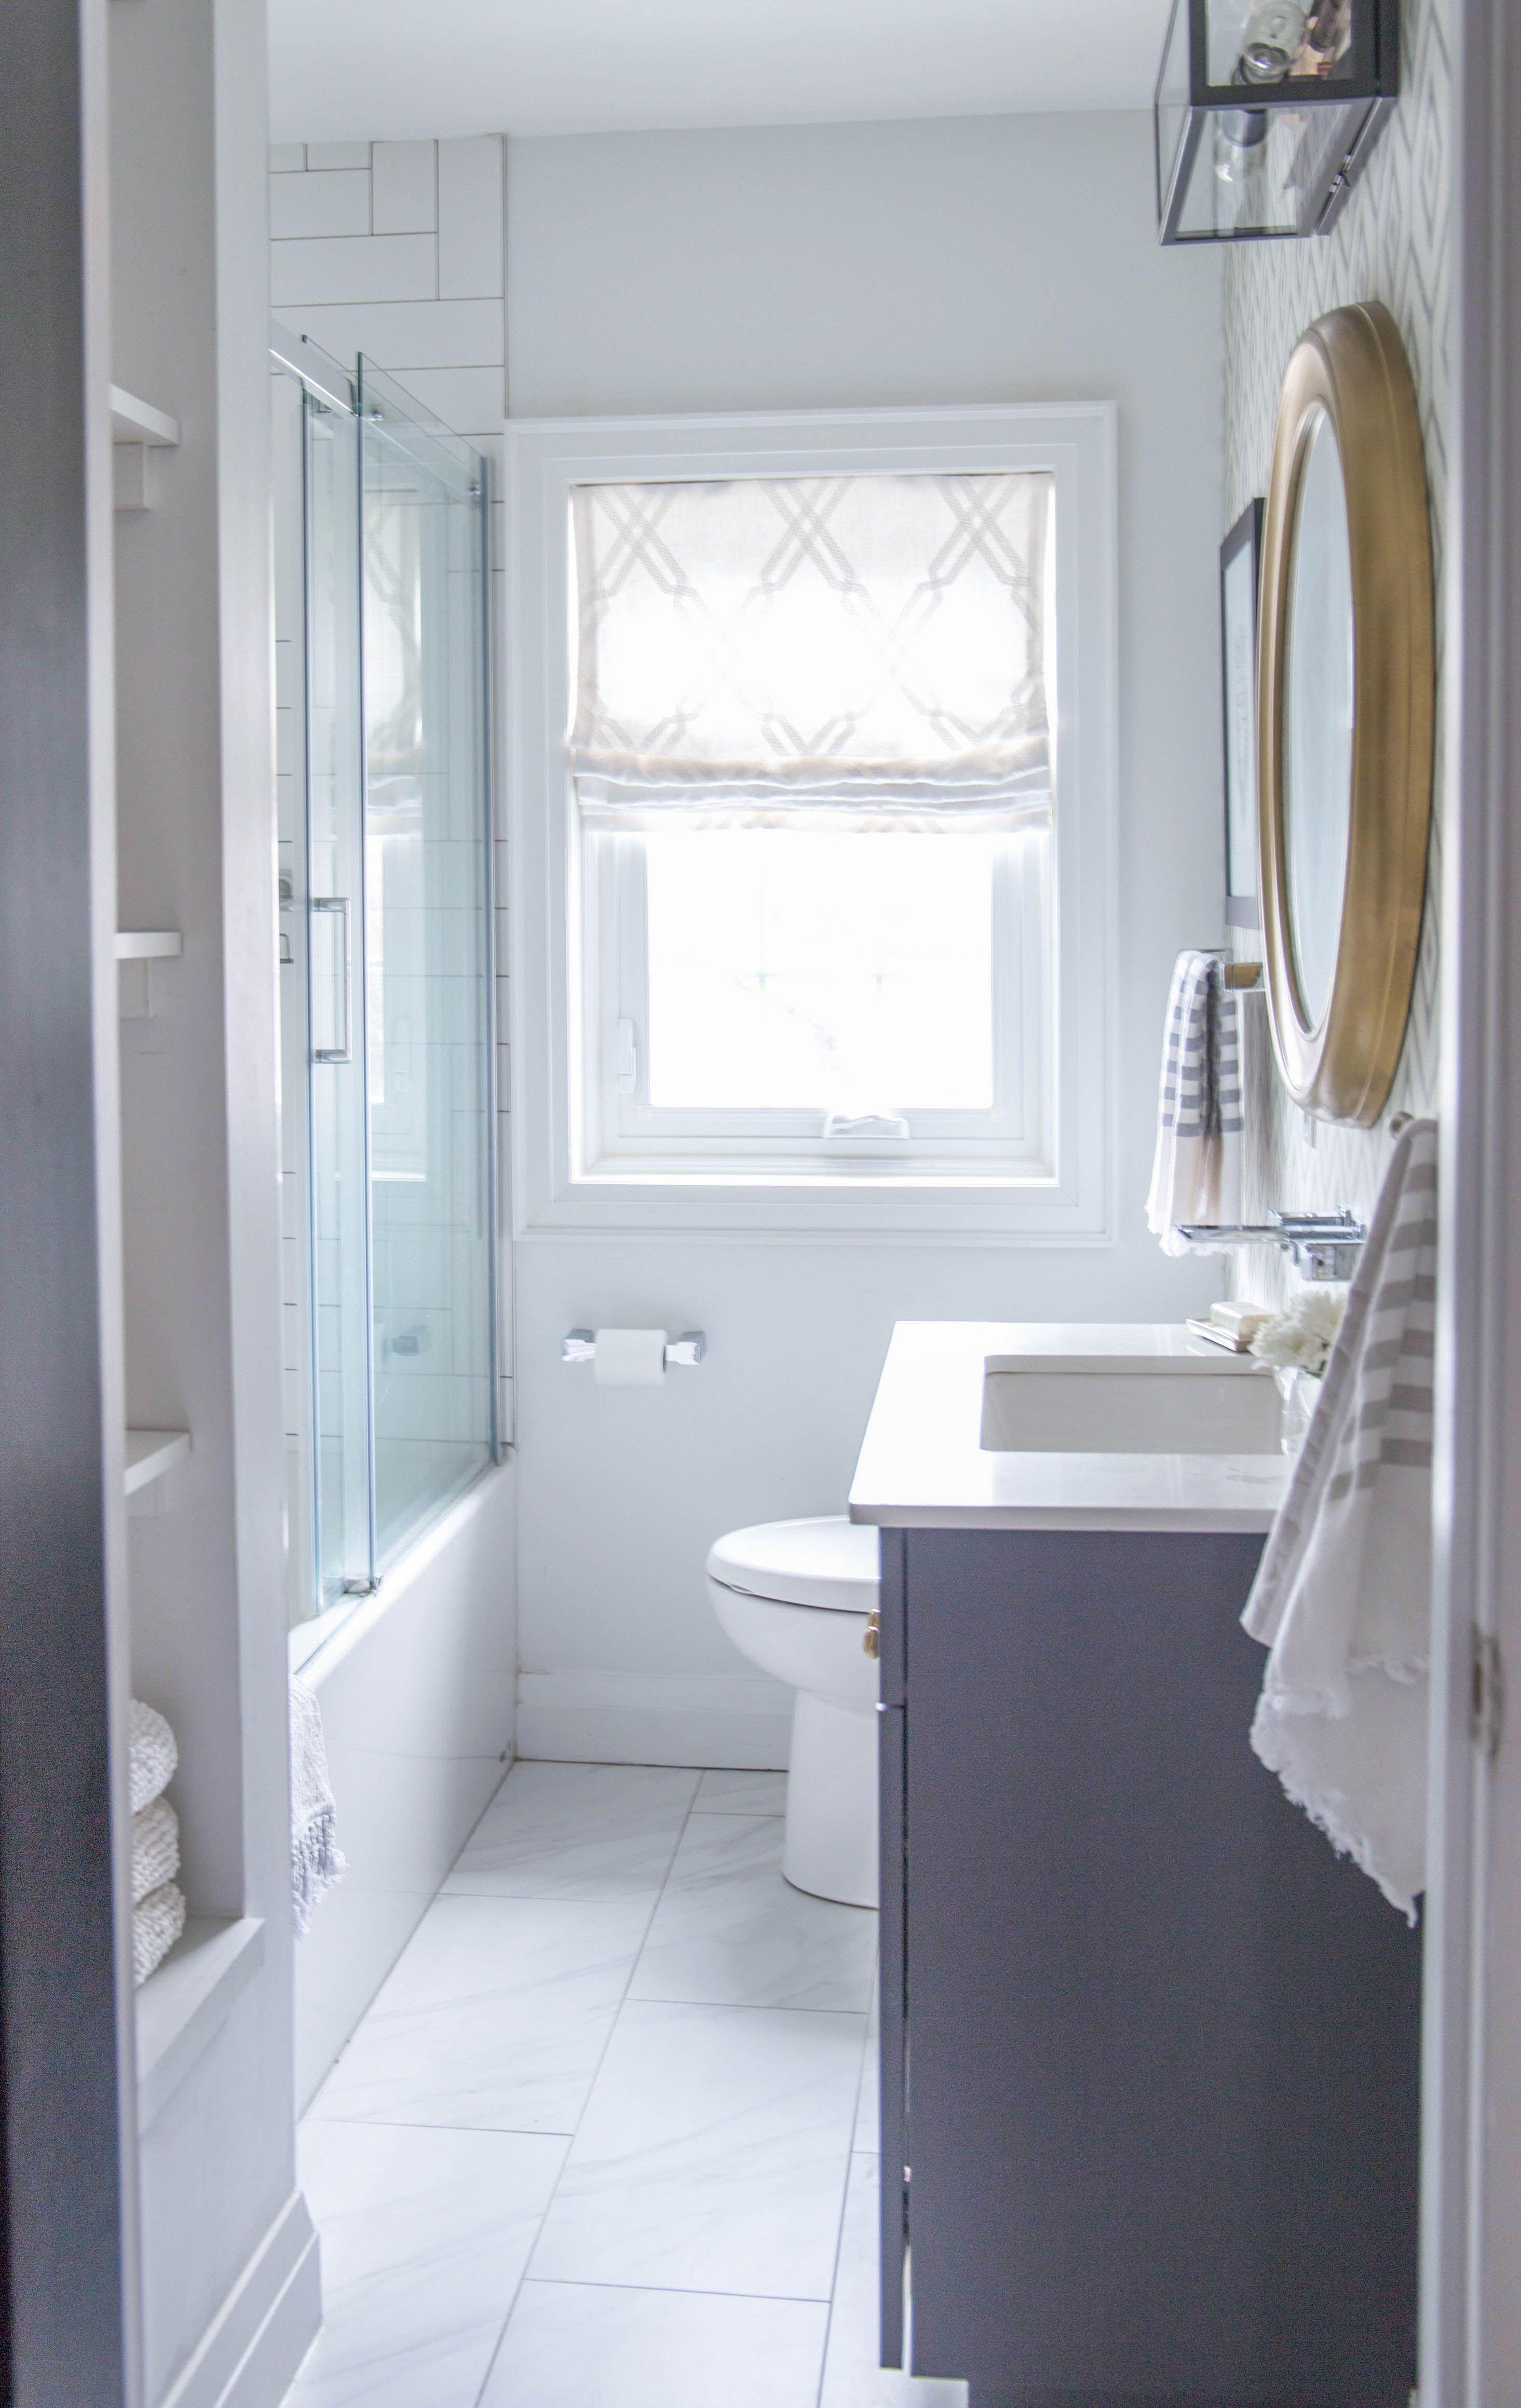 Property Brothers Bathroom Reveal By Karin Bennett Designs Bathroom Brightwhite Clean Sim Bathrooms Remodel Bathroom Remodel Master Small Bathroom Remodel